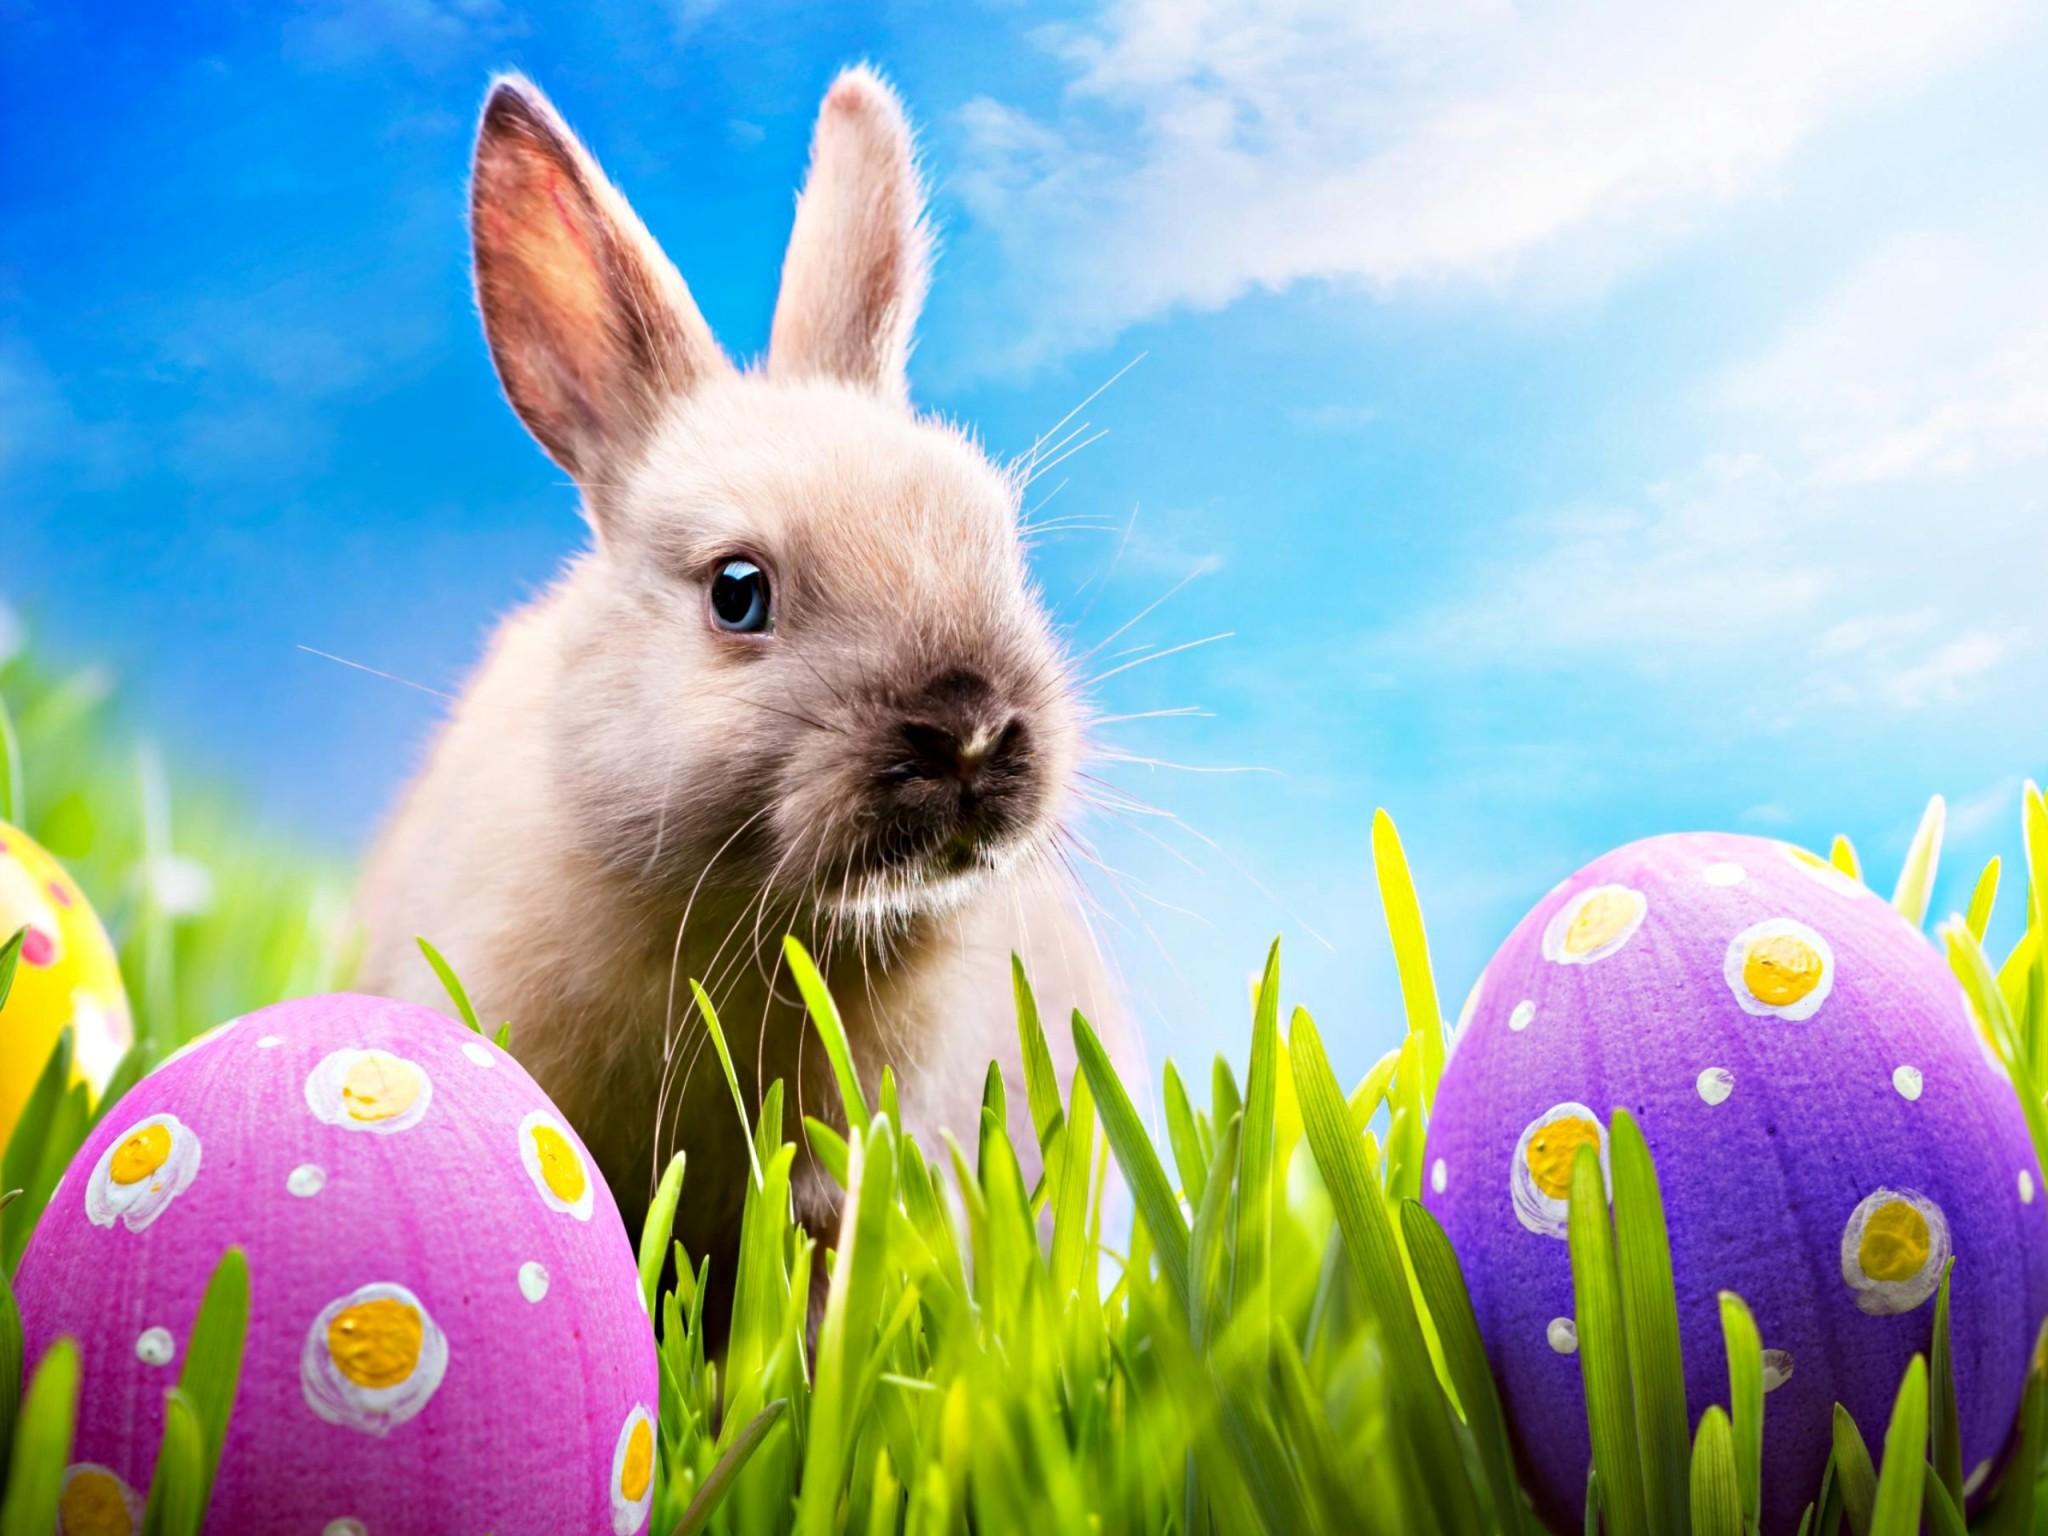 Easter bunny desktop wallpaper wallpapertag - Easter bunny wallpaper ...